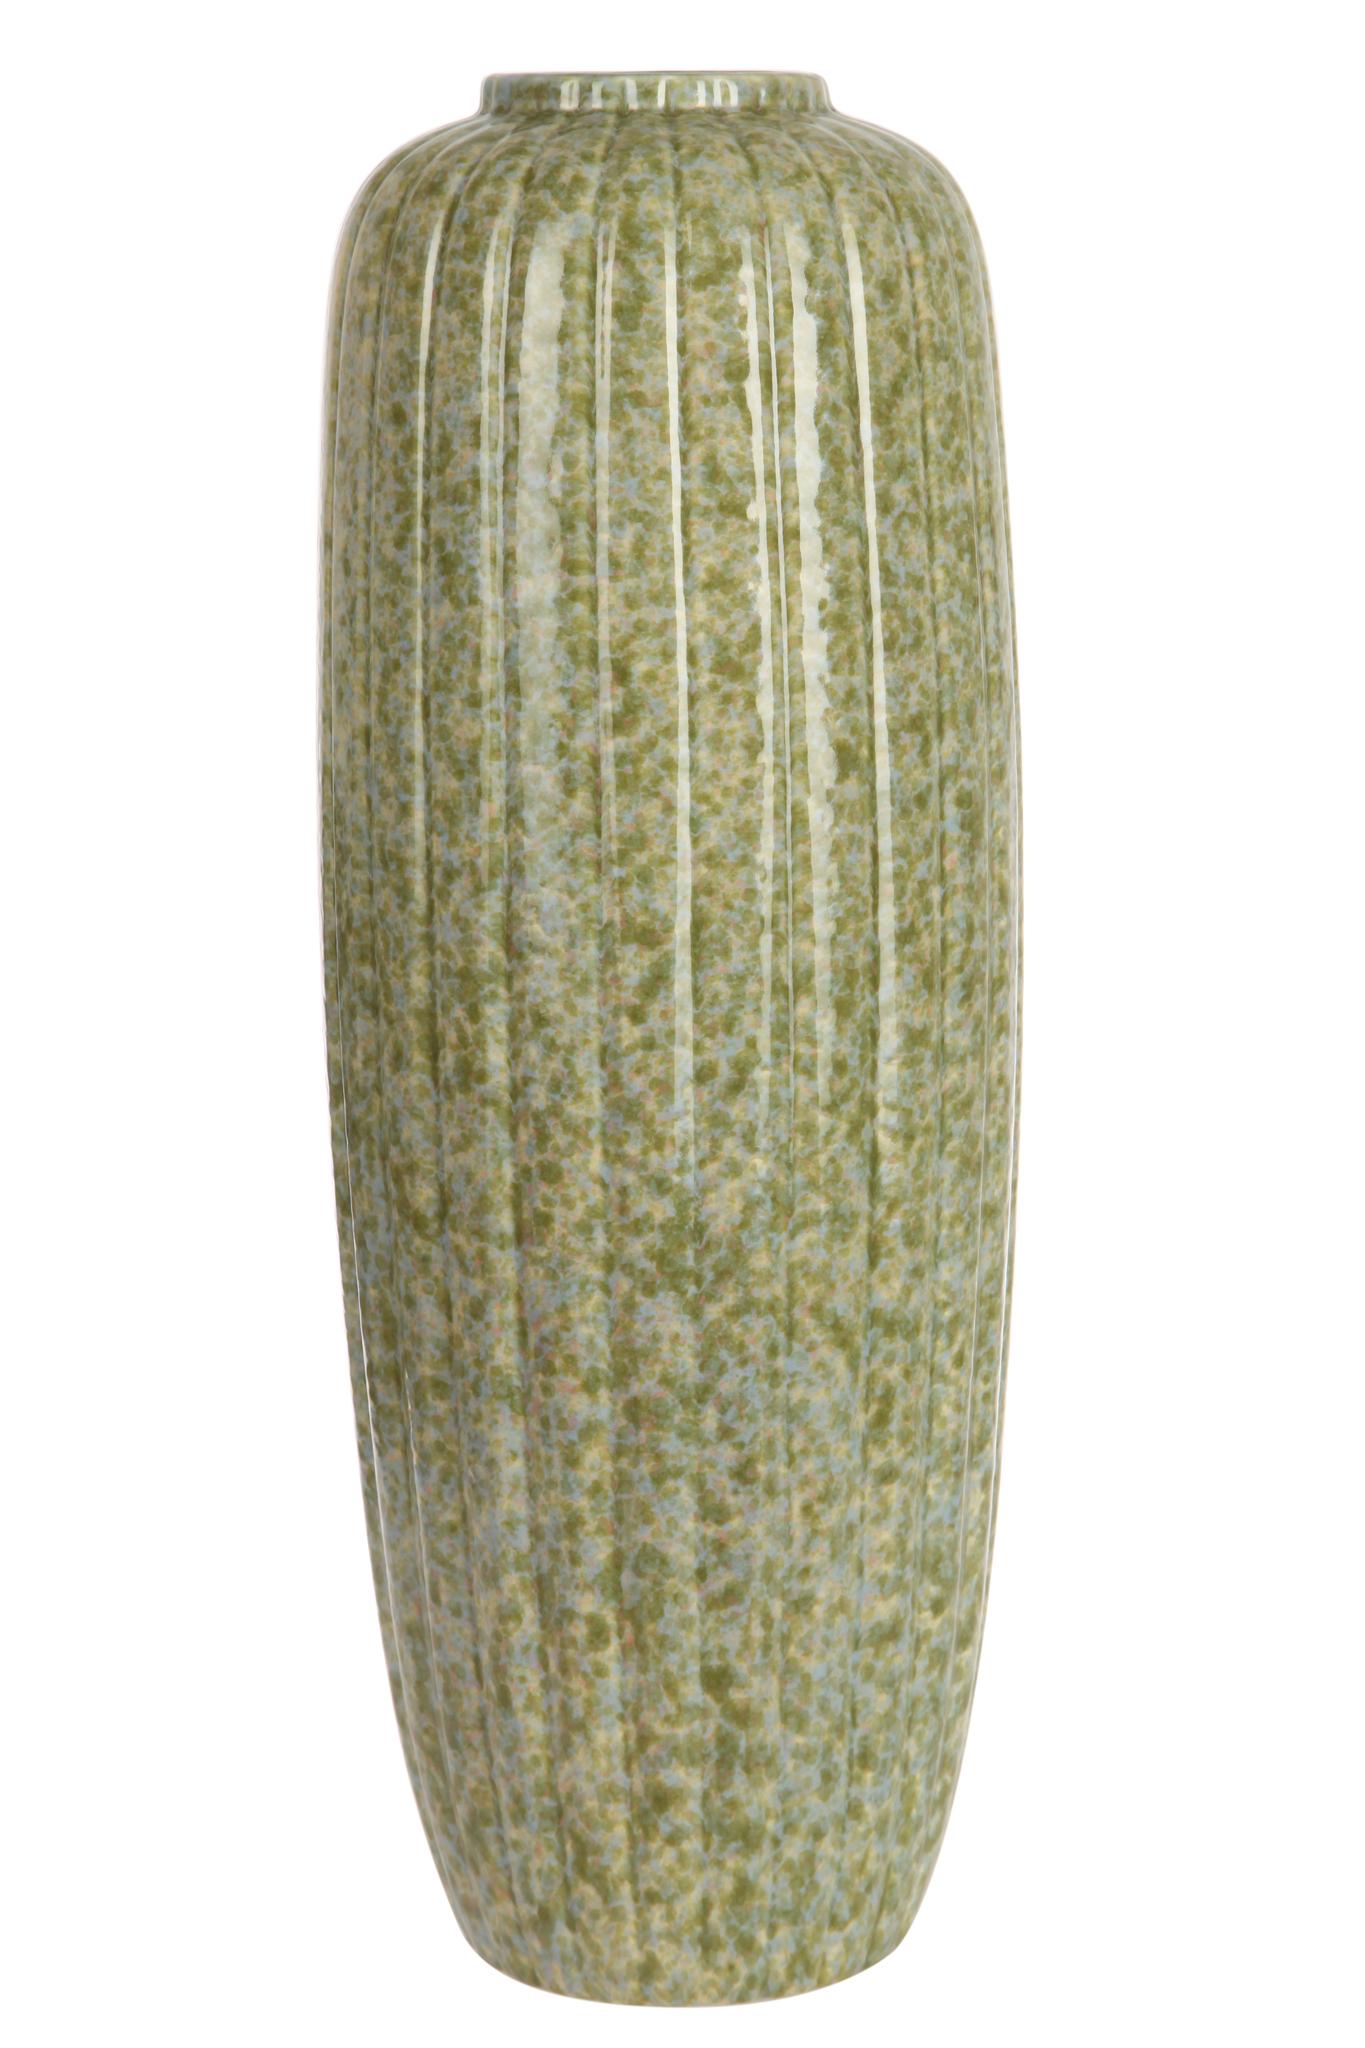 Вазы настольные Ваза декоративная Sporvil 1043-1280R vaza-dekorativnaya-sporvil-1043-1280r-portugaliya.jpg